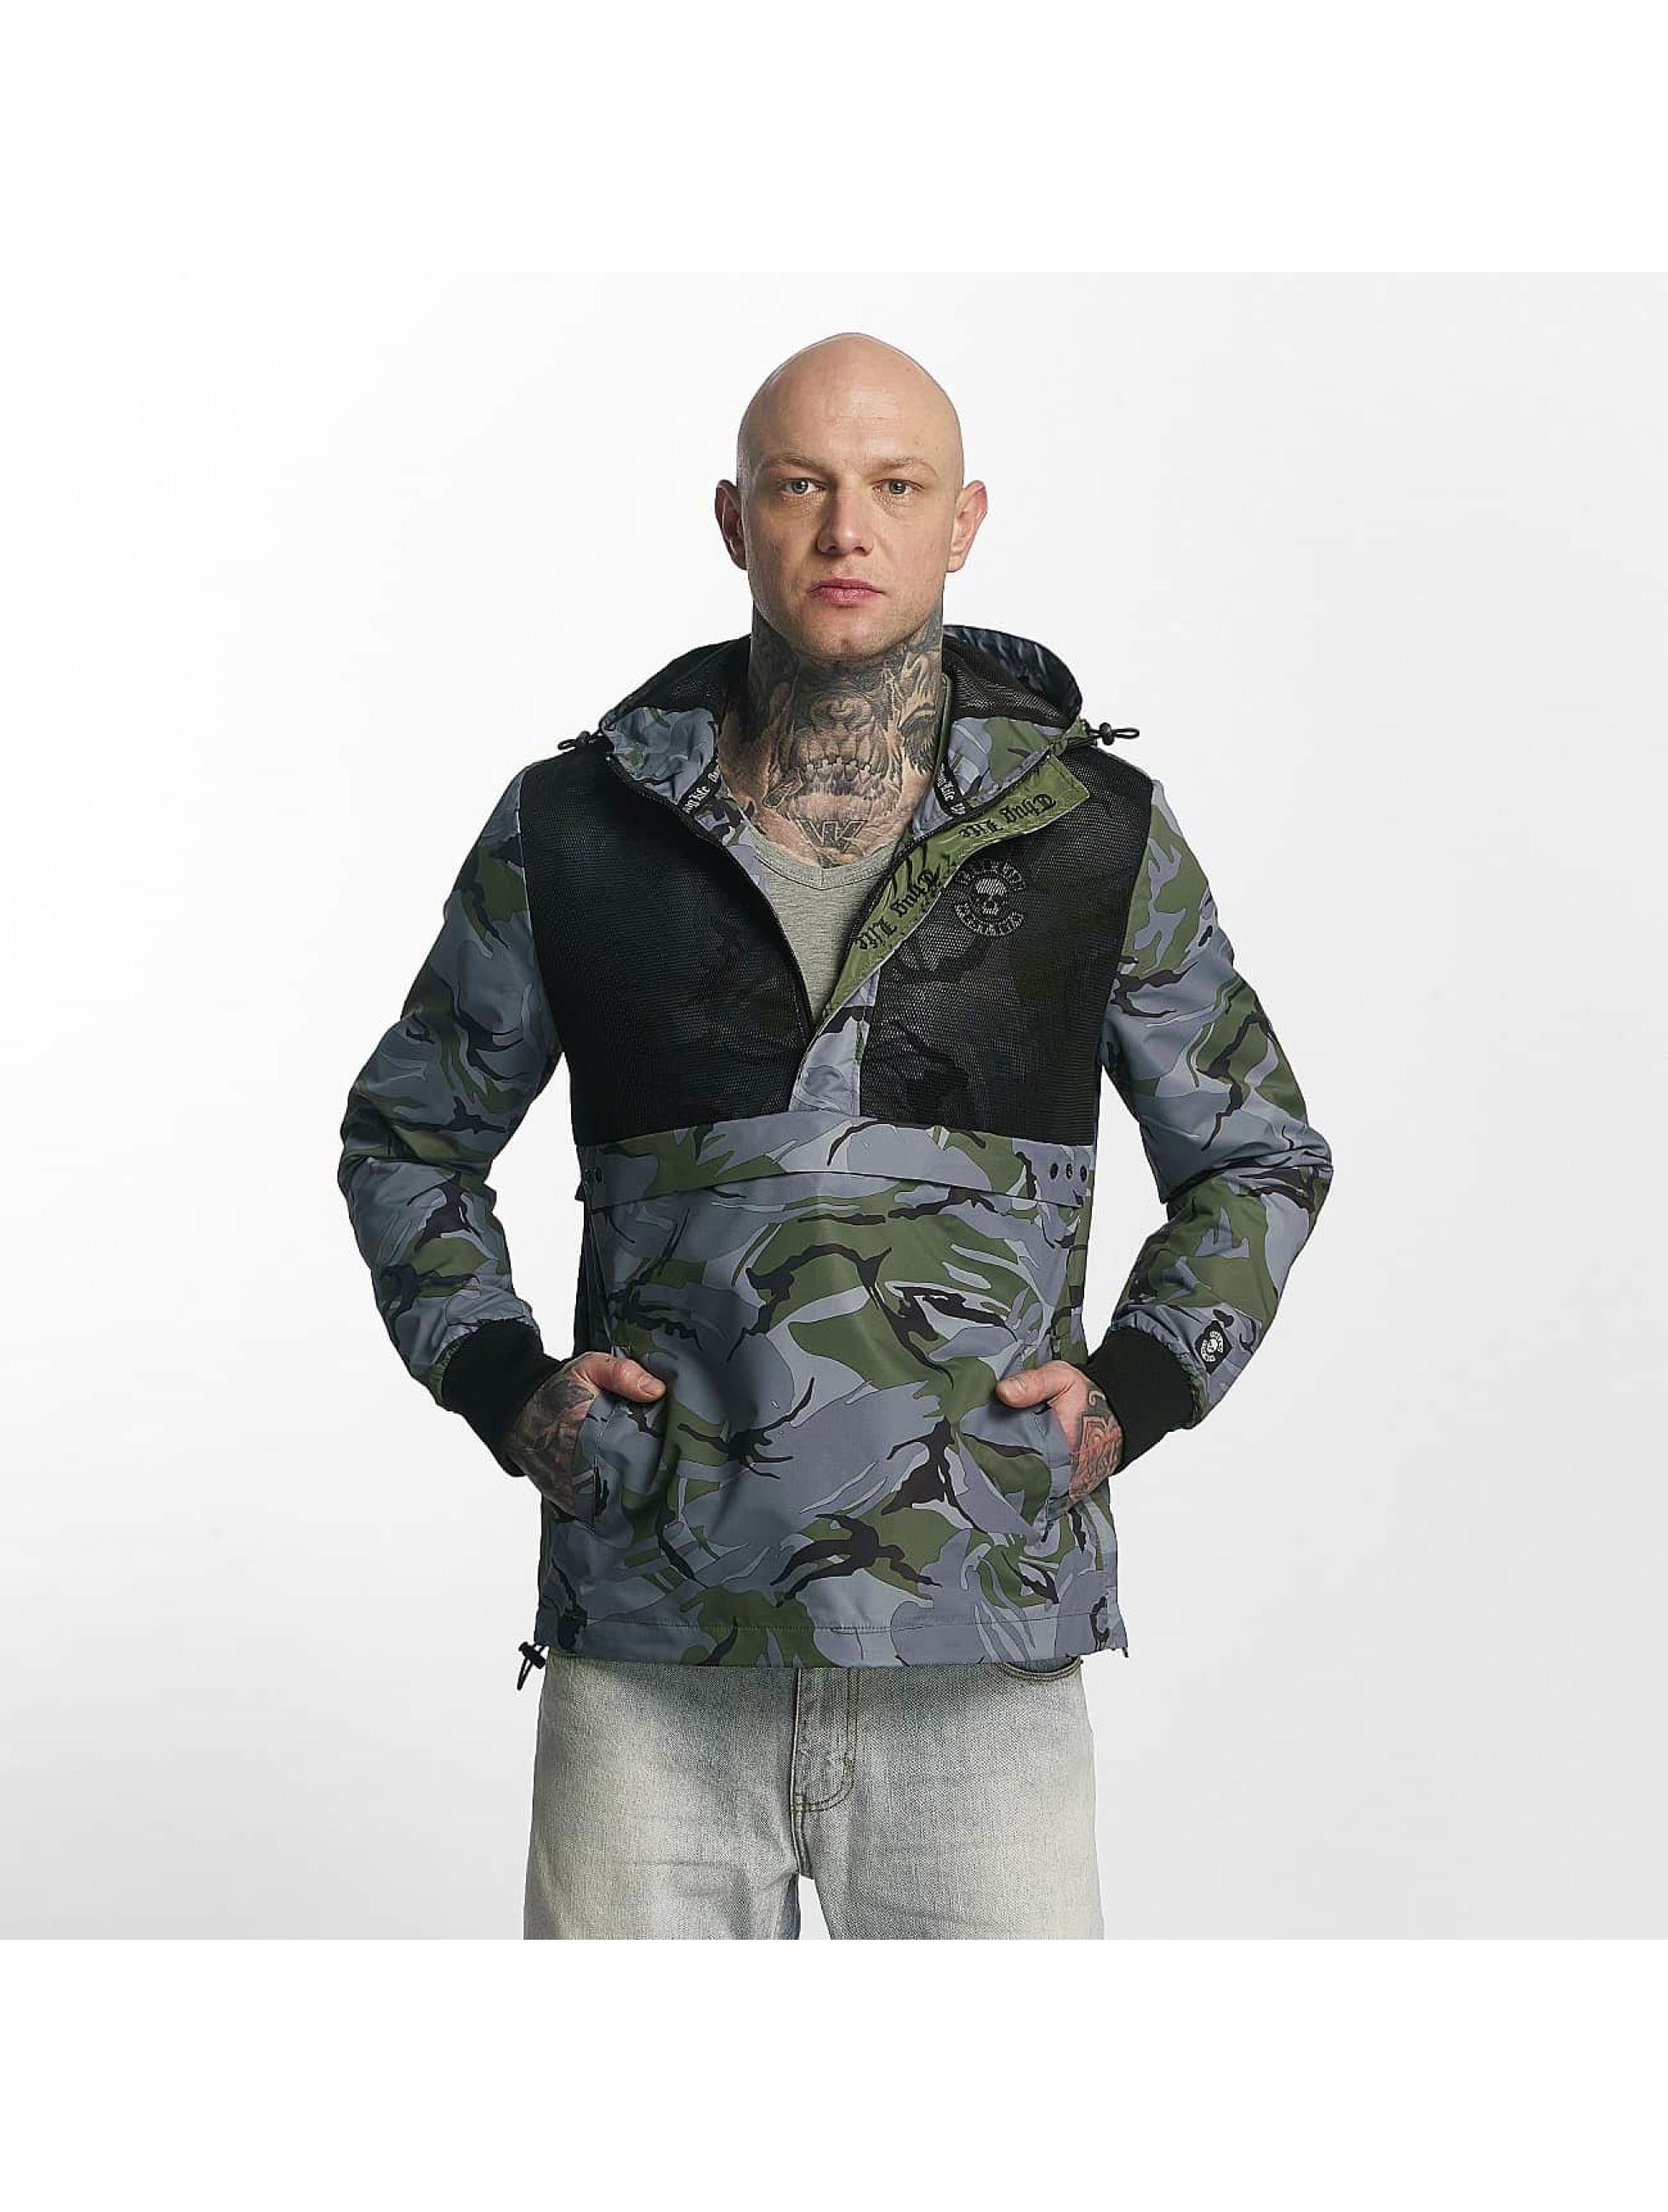 Thug Life / Lightweight Jacket Skin in black XL